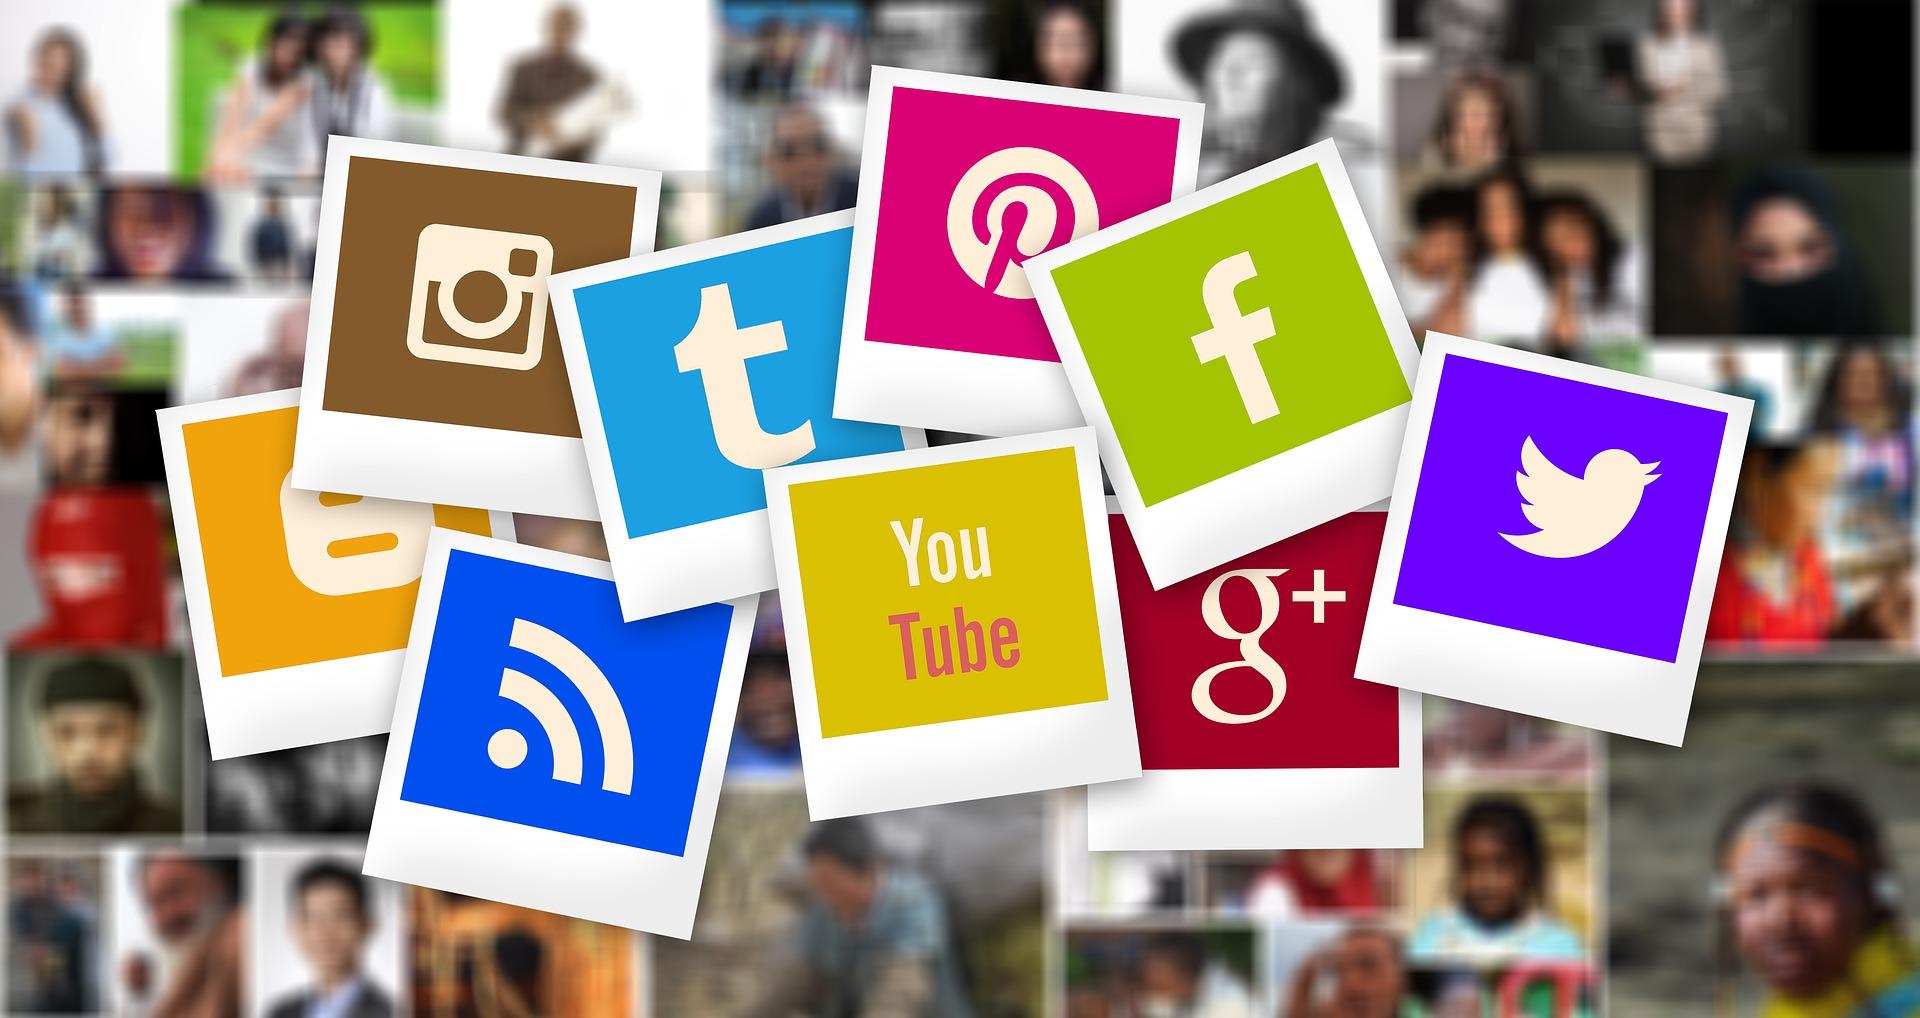 Social Media Marketing a Torino Esperto social media manager torino consulente social media manager torino